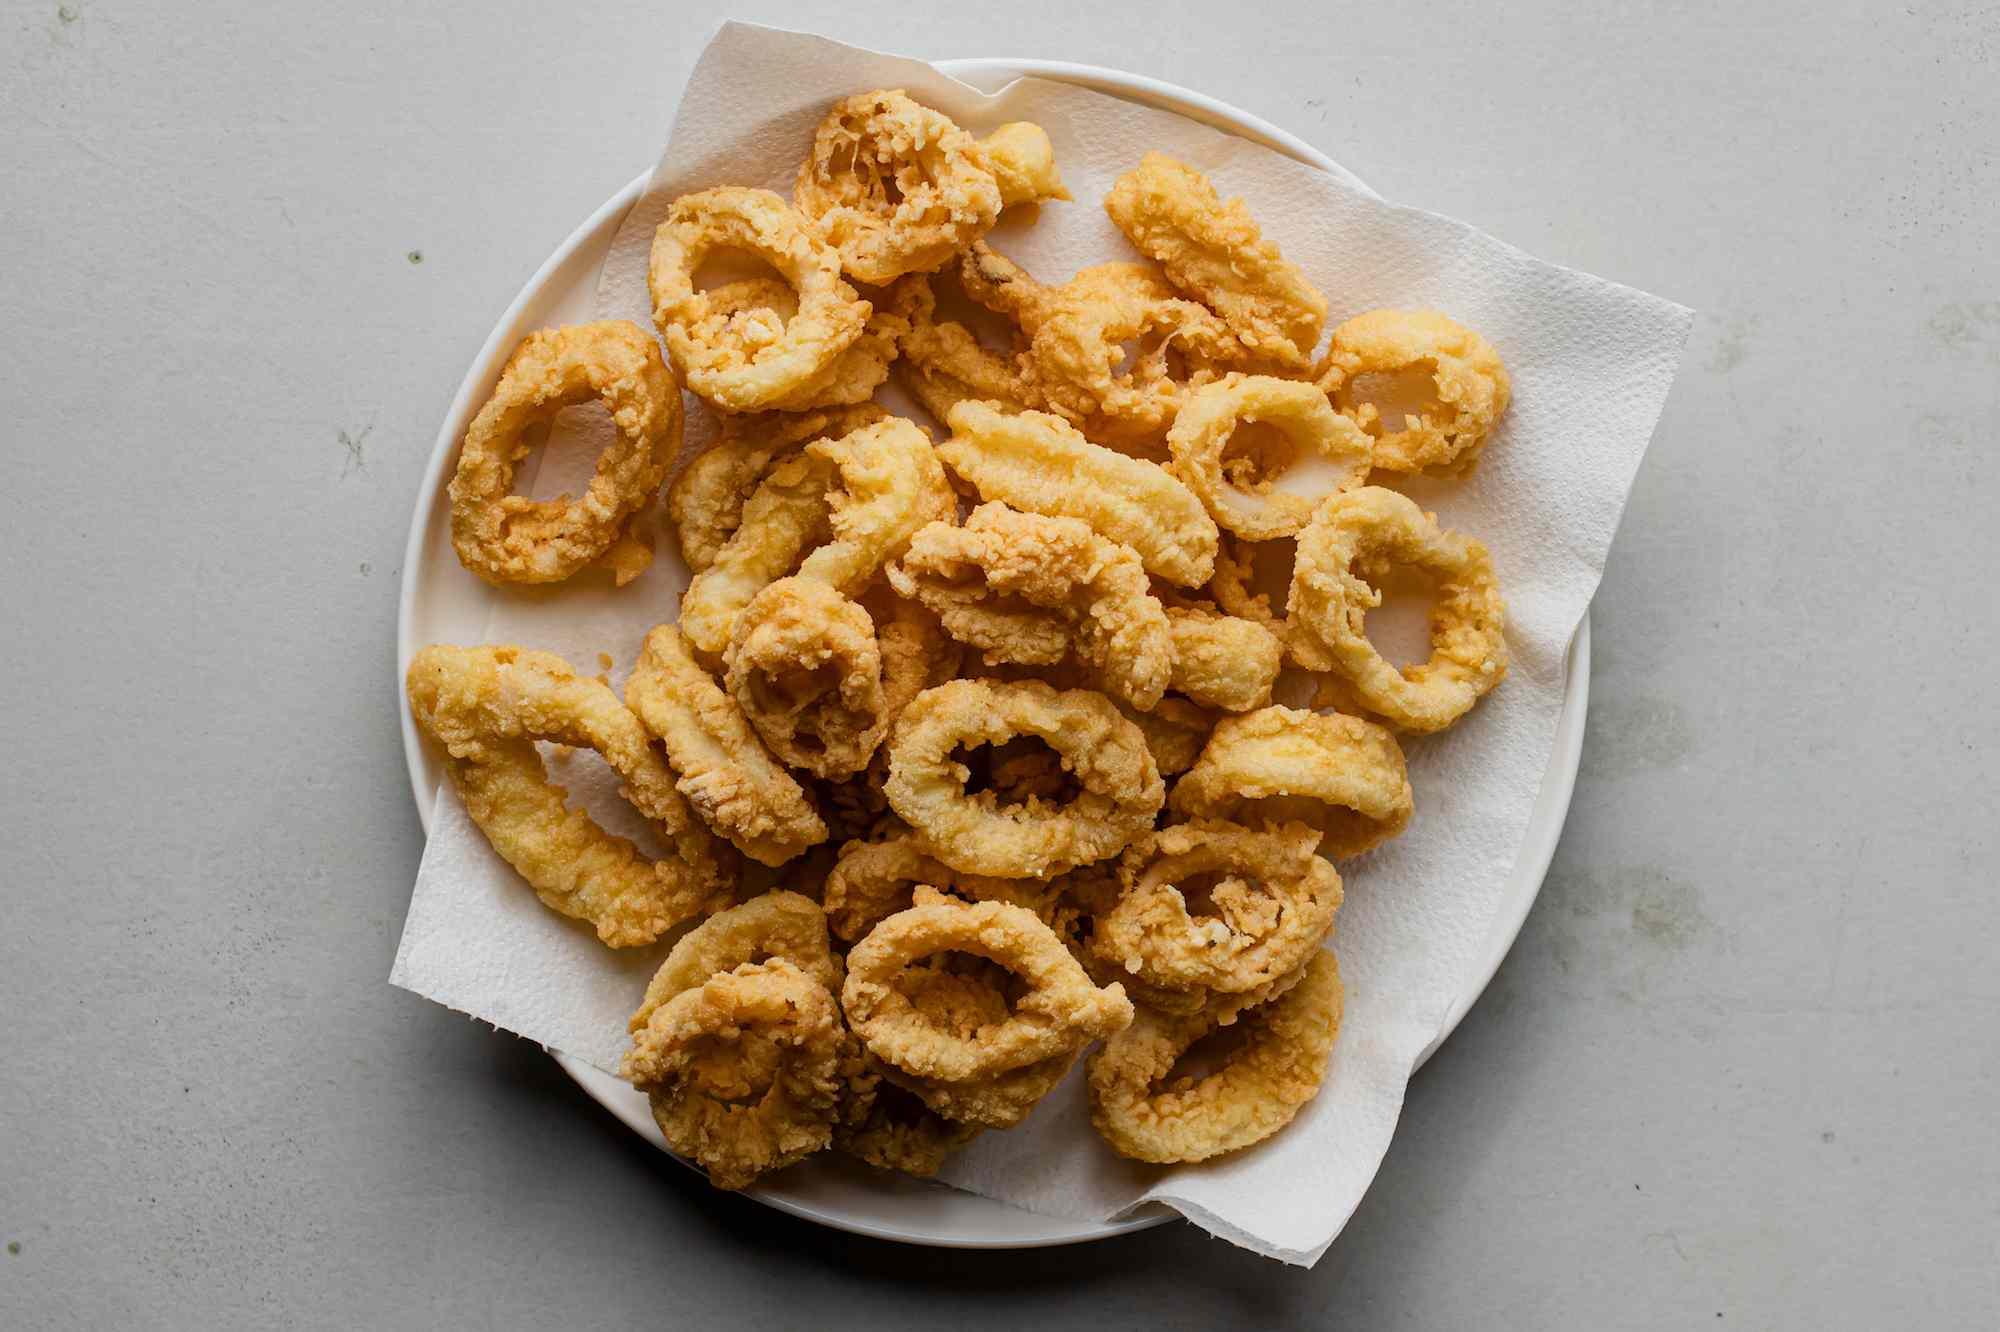 Place fried calamari on paper towels